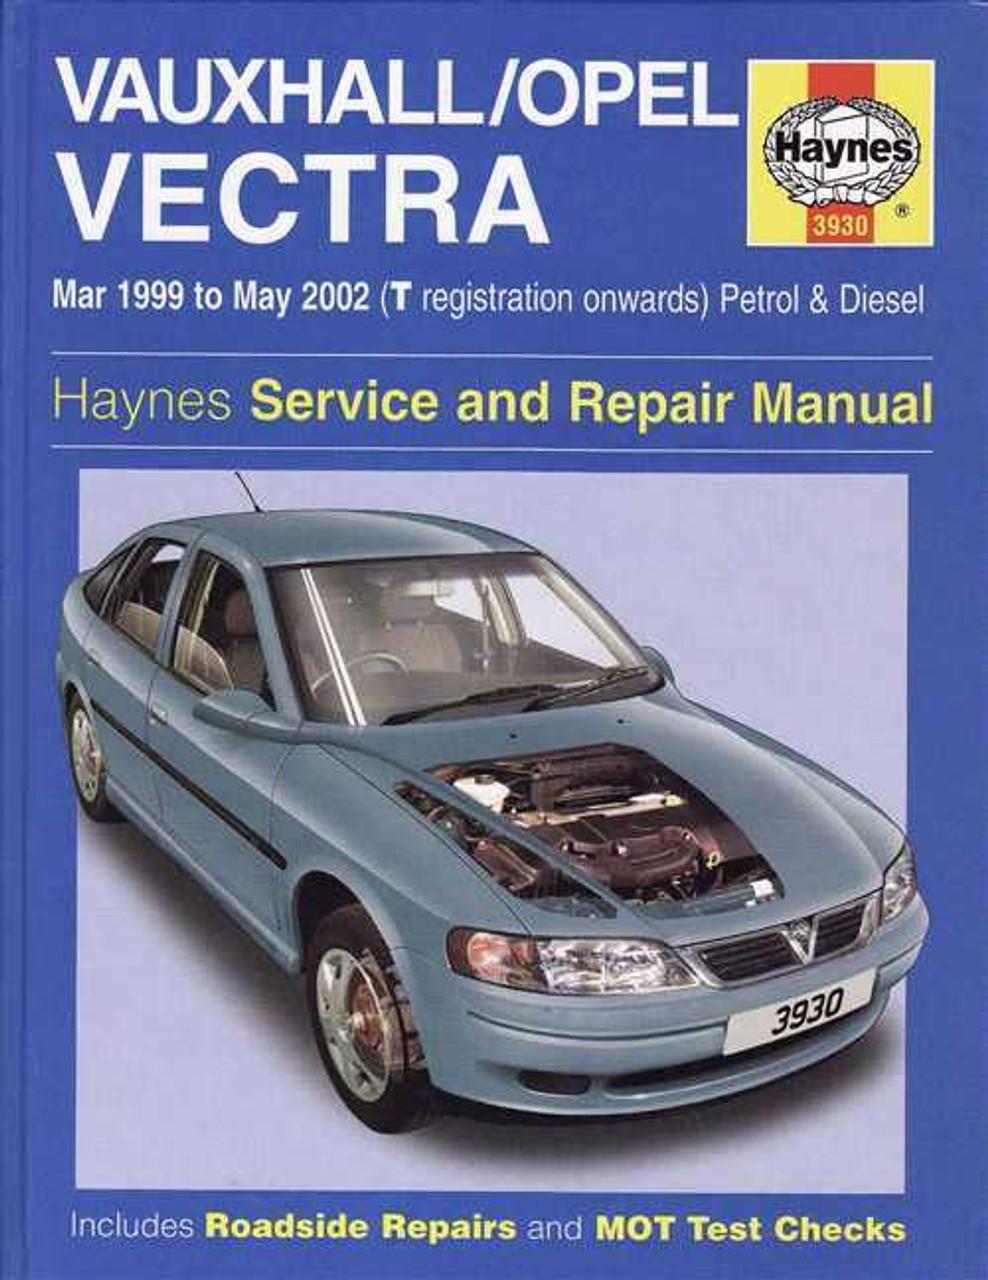 holden vectra vauxhall opel 1999 2002 workshop manual rh automotobookshop com au opel zafira b manual pdf vauxhall zafira b repair manual free download